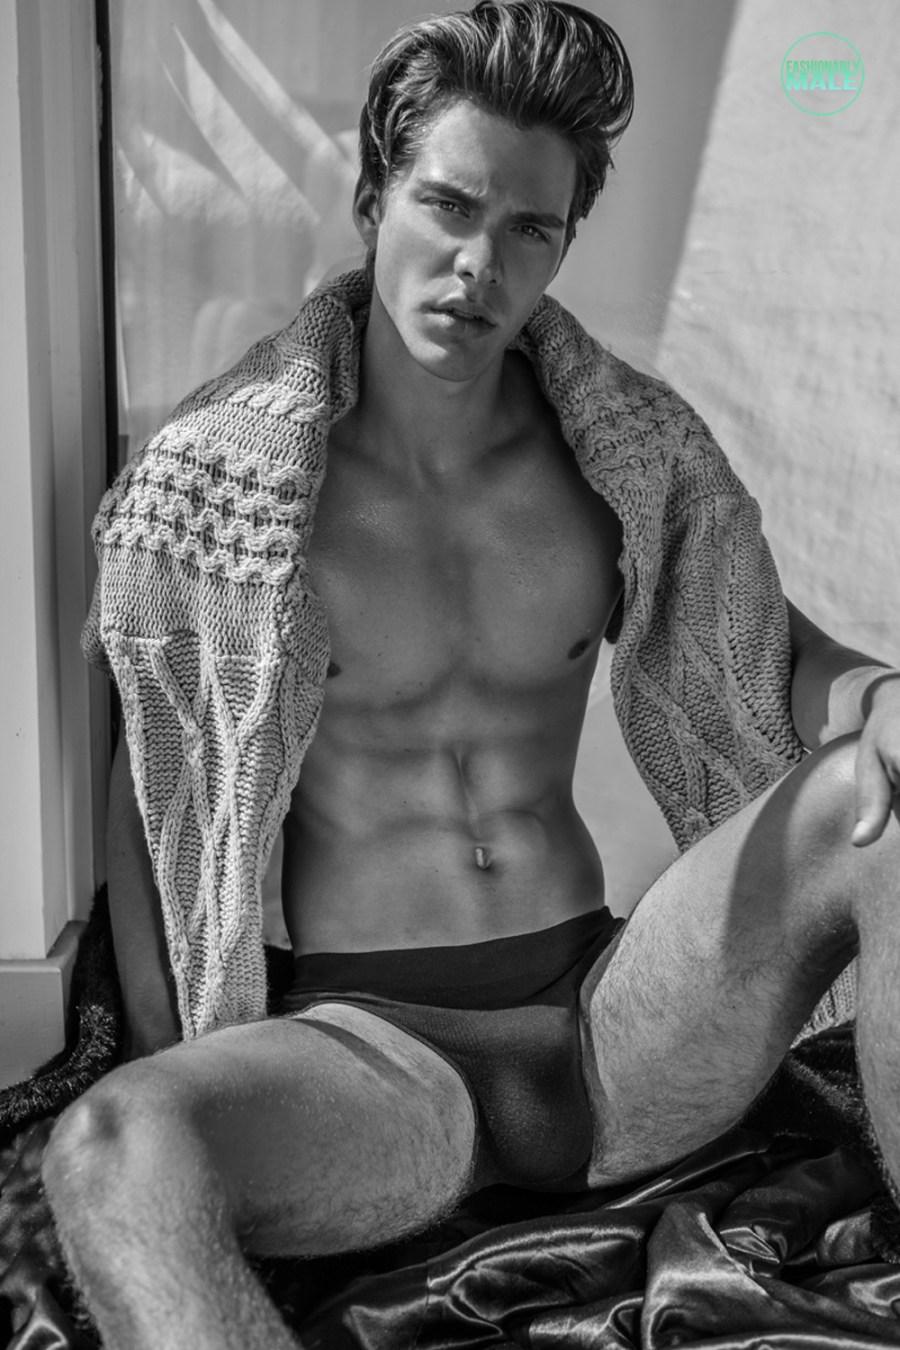 Connor Straathof06